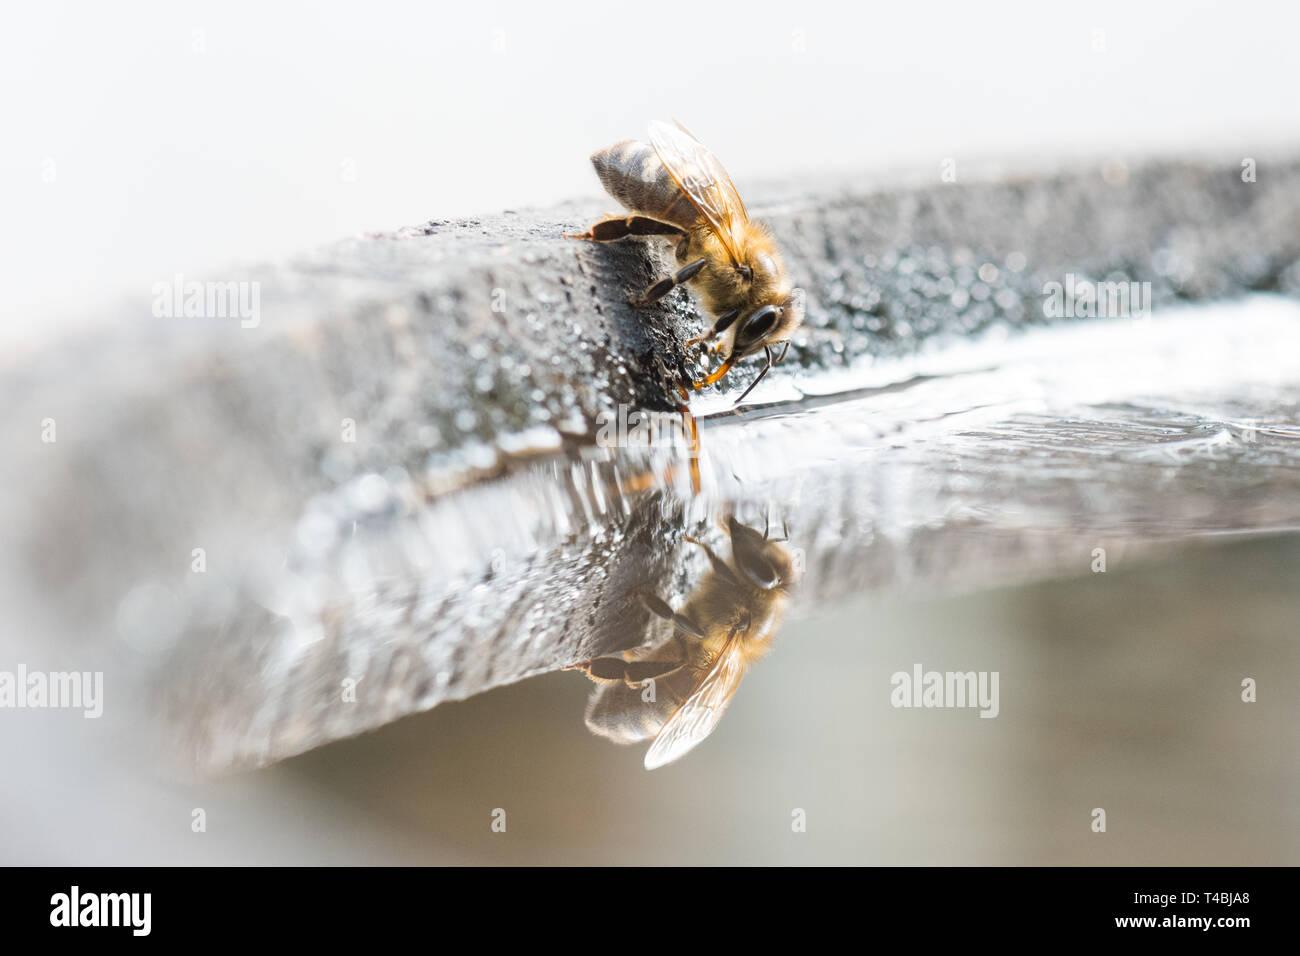 Honey Bee - Apis mellifera - drinking water from bird bath, UK Stock Photo